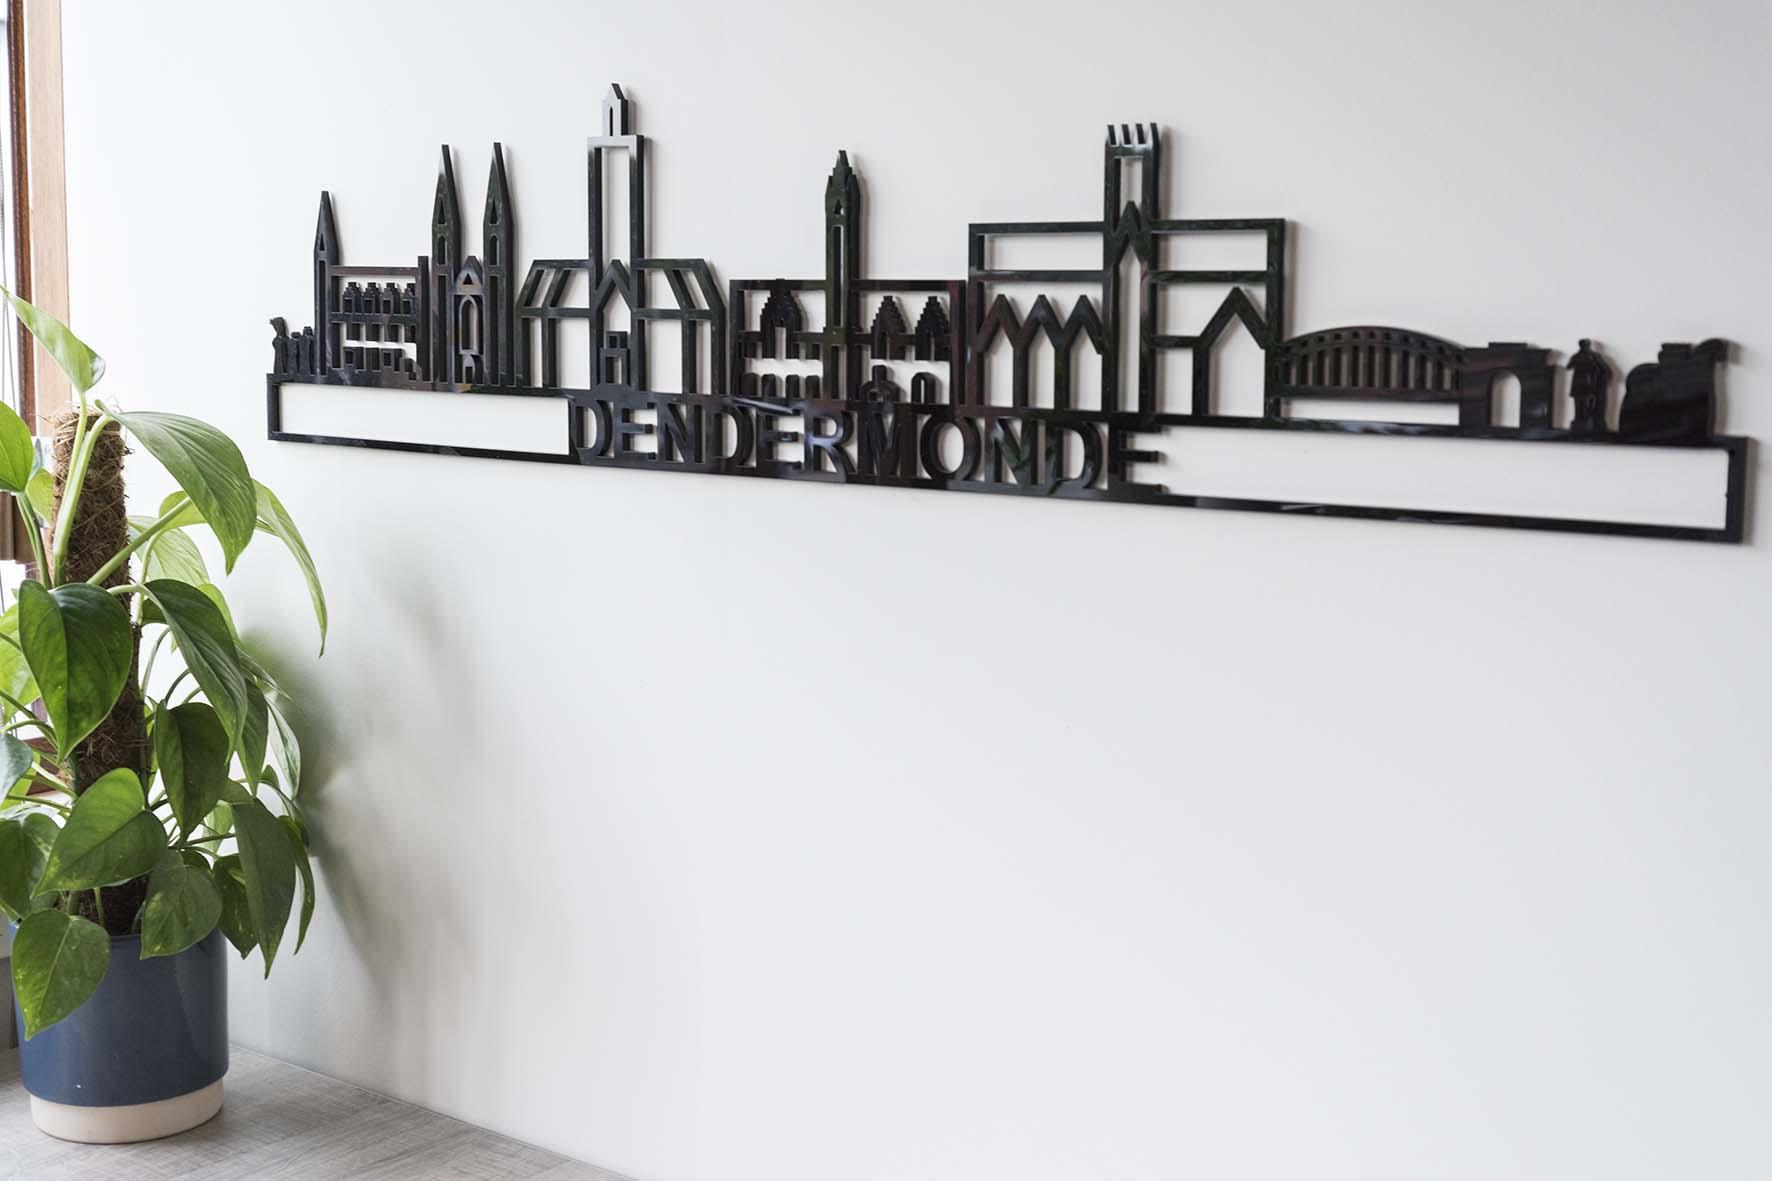 Skyline Dendermonde zwart kunststof